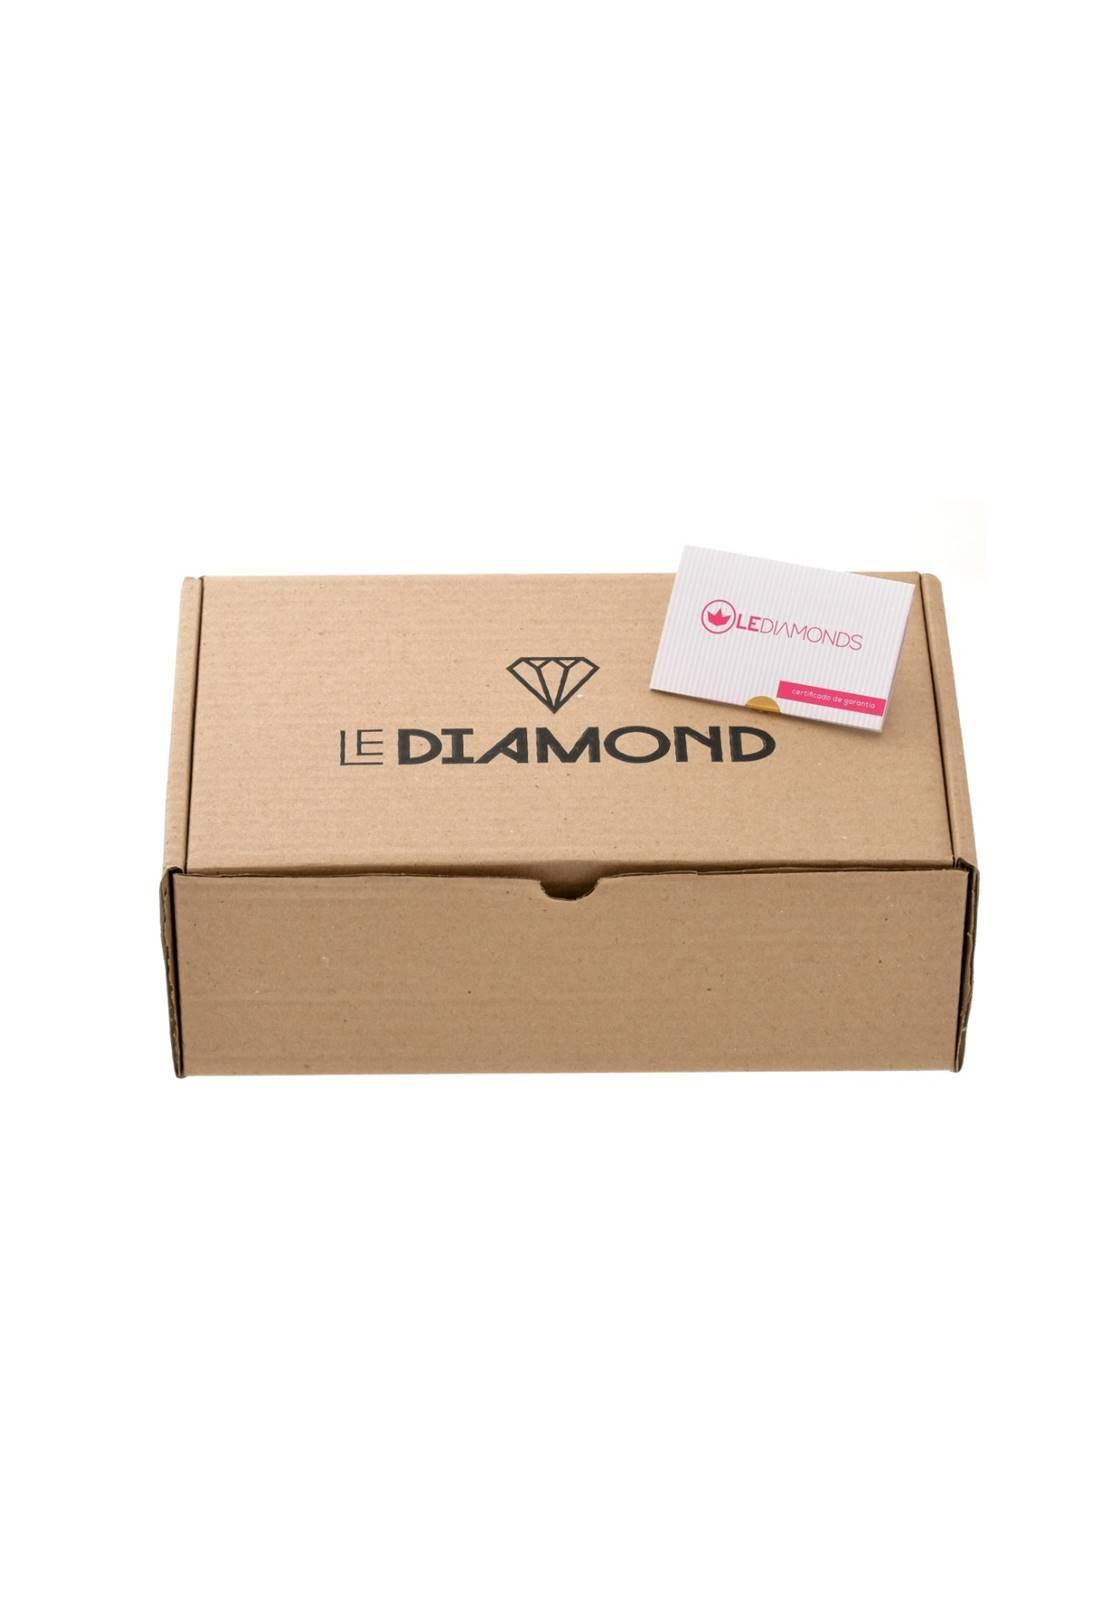 Brinco Le Diamond Oval Cristal Lapidado